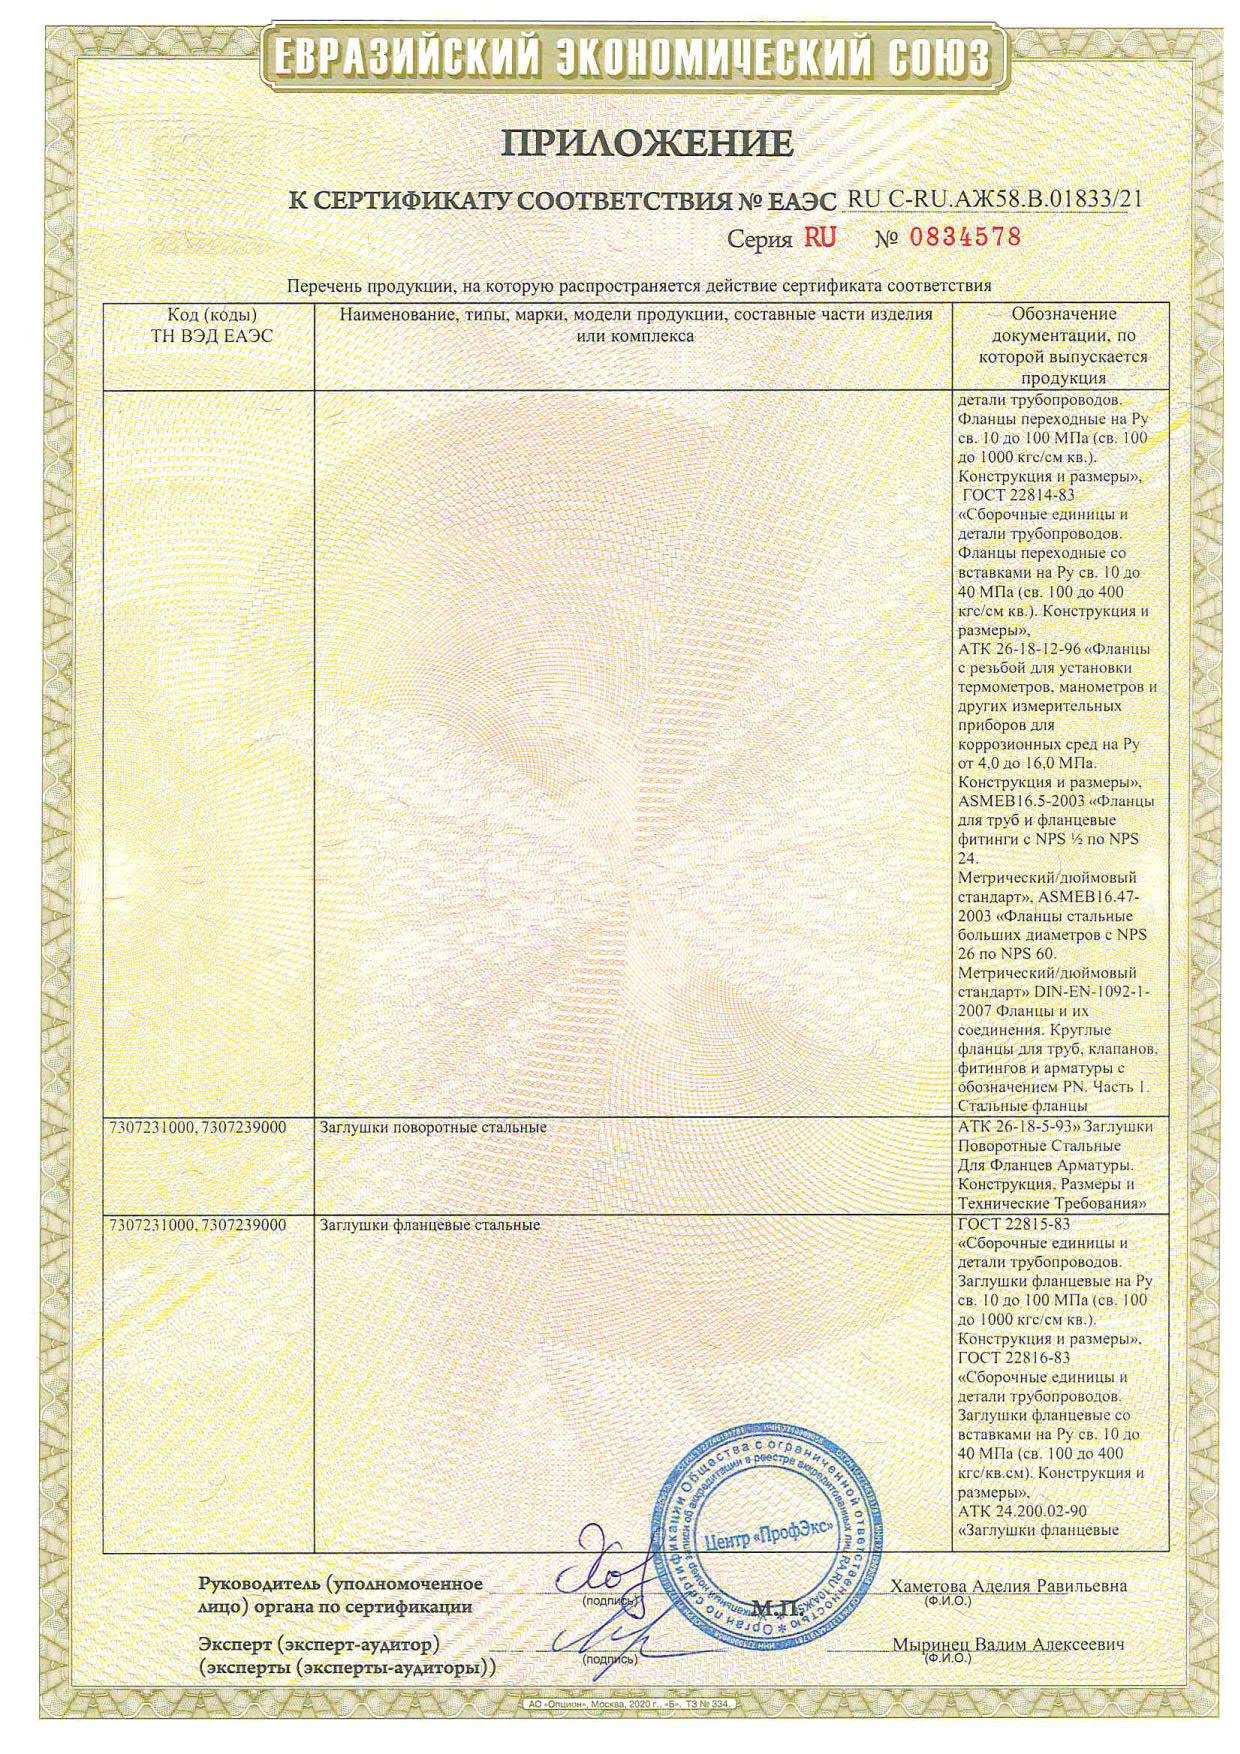 Сертификат ТР ТС 2021_3